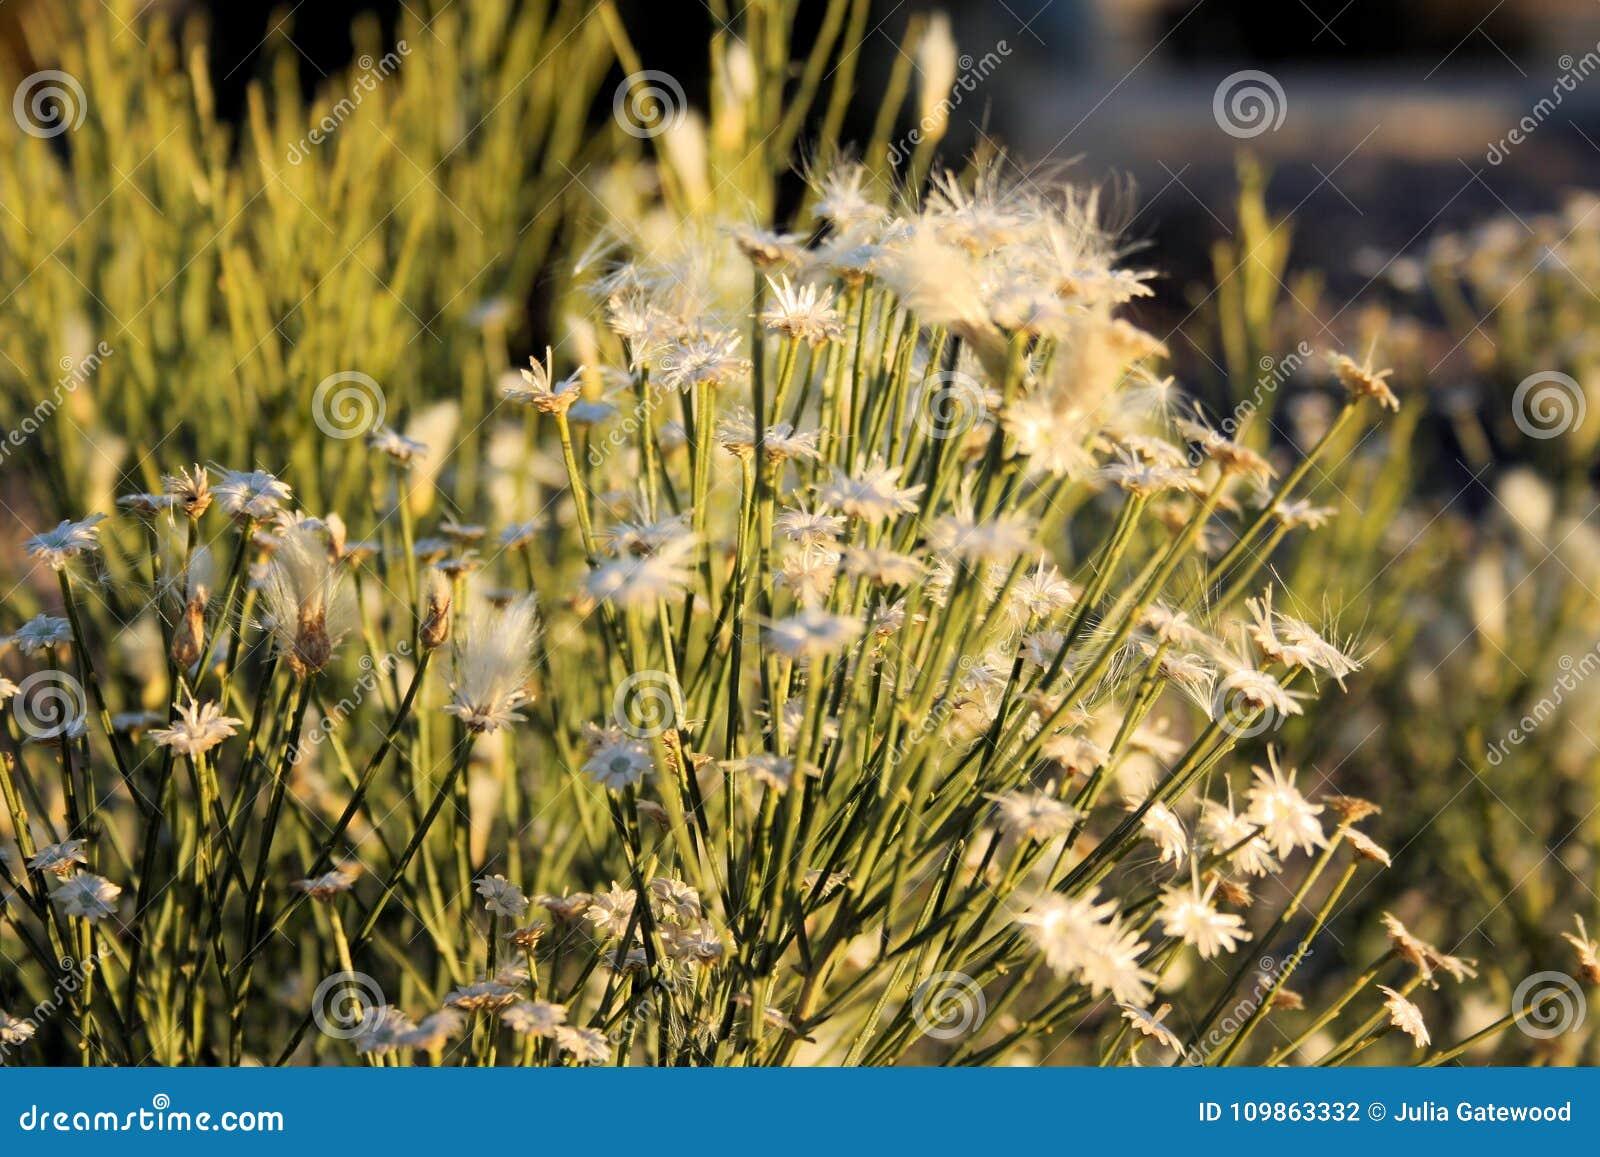 White Desert Flowers Stock Photo Image Of Round First 109863332